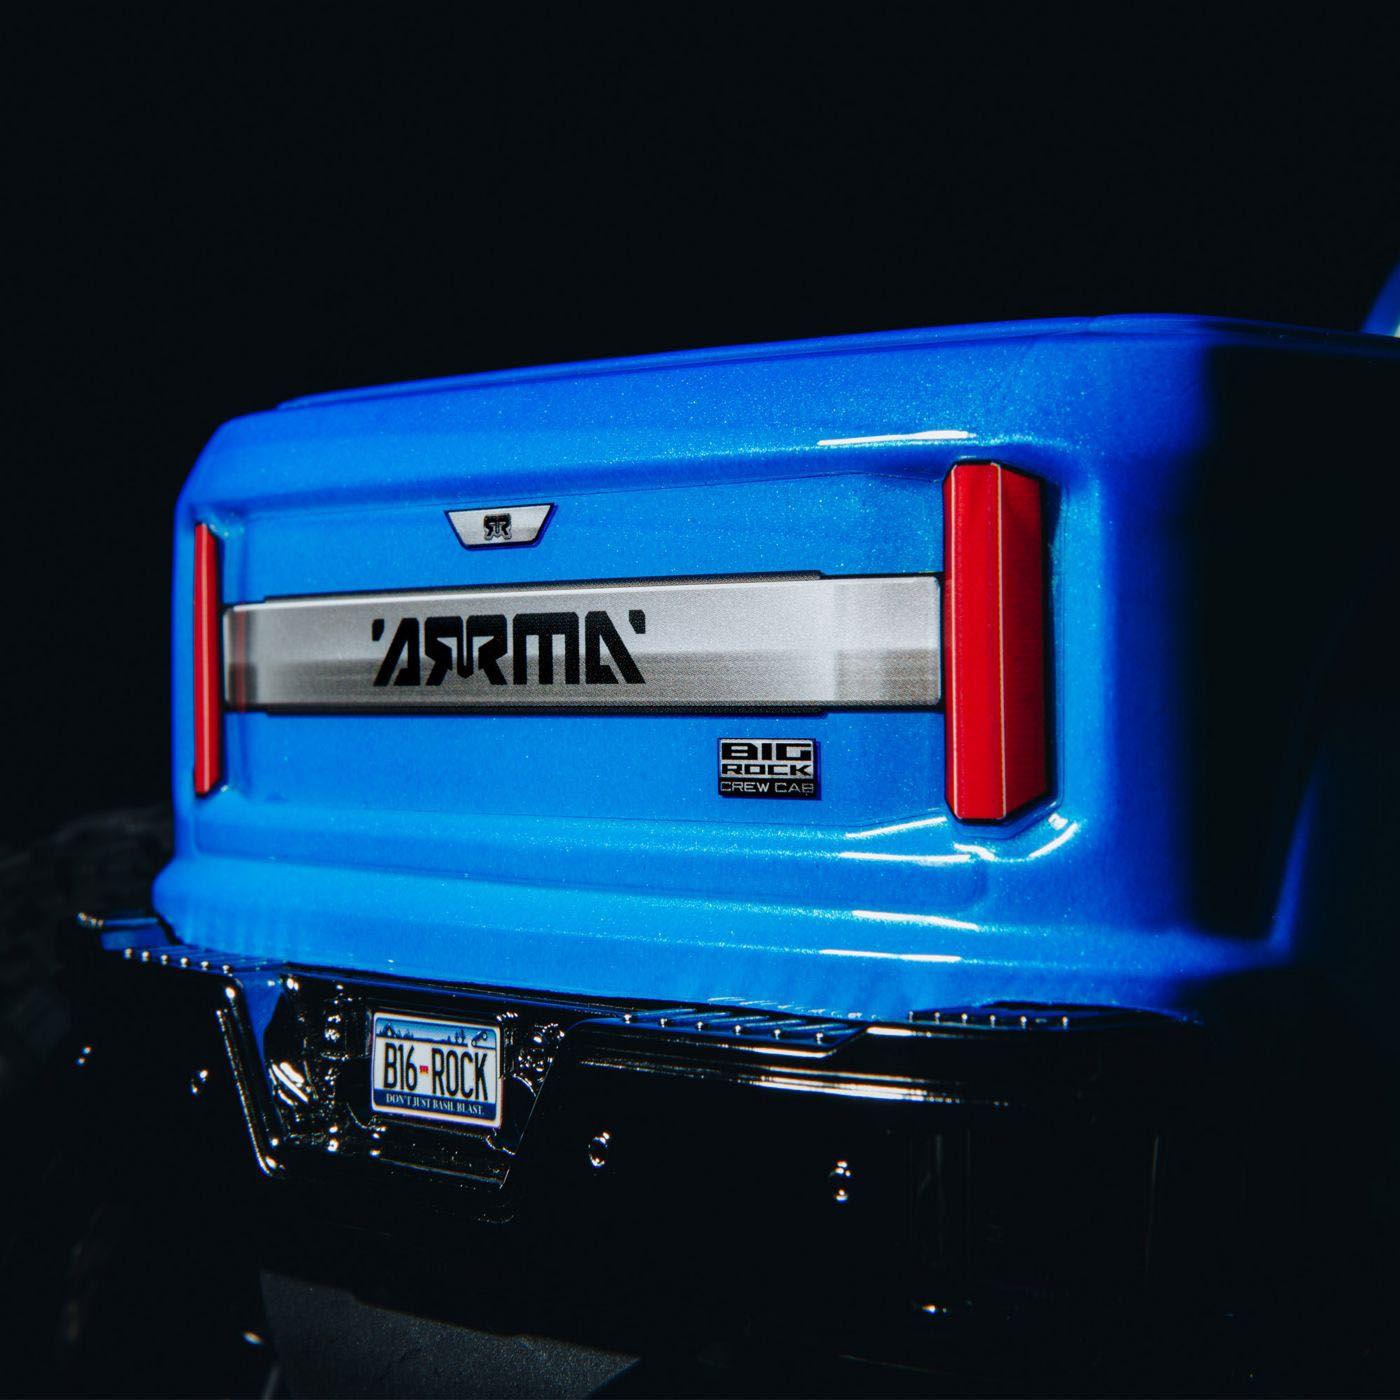 Arrma Big Rock Crew Cab 3S 4x4 Brushless RTR 8